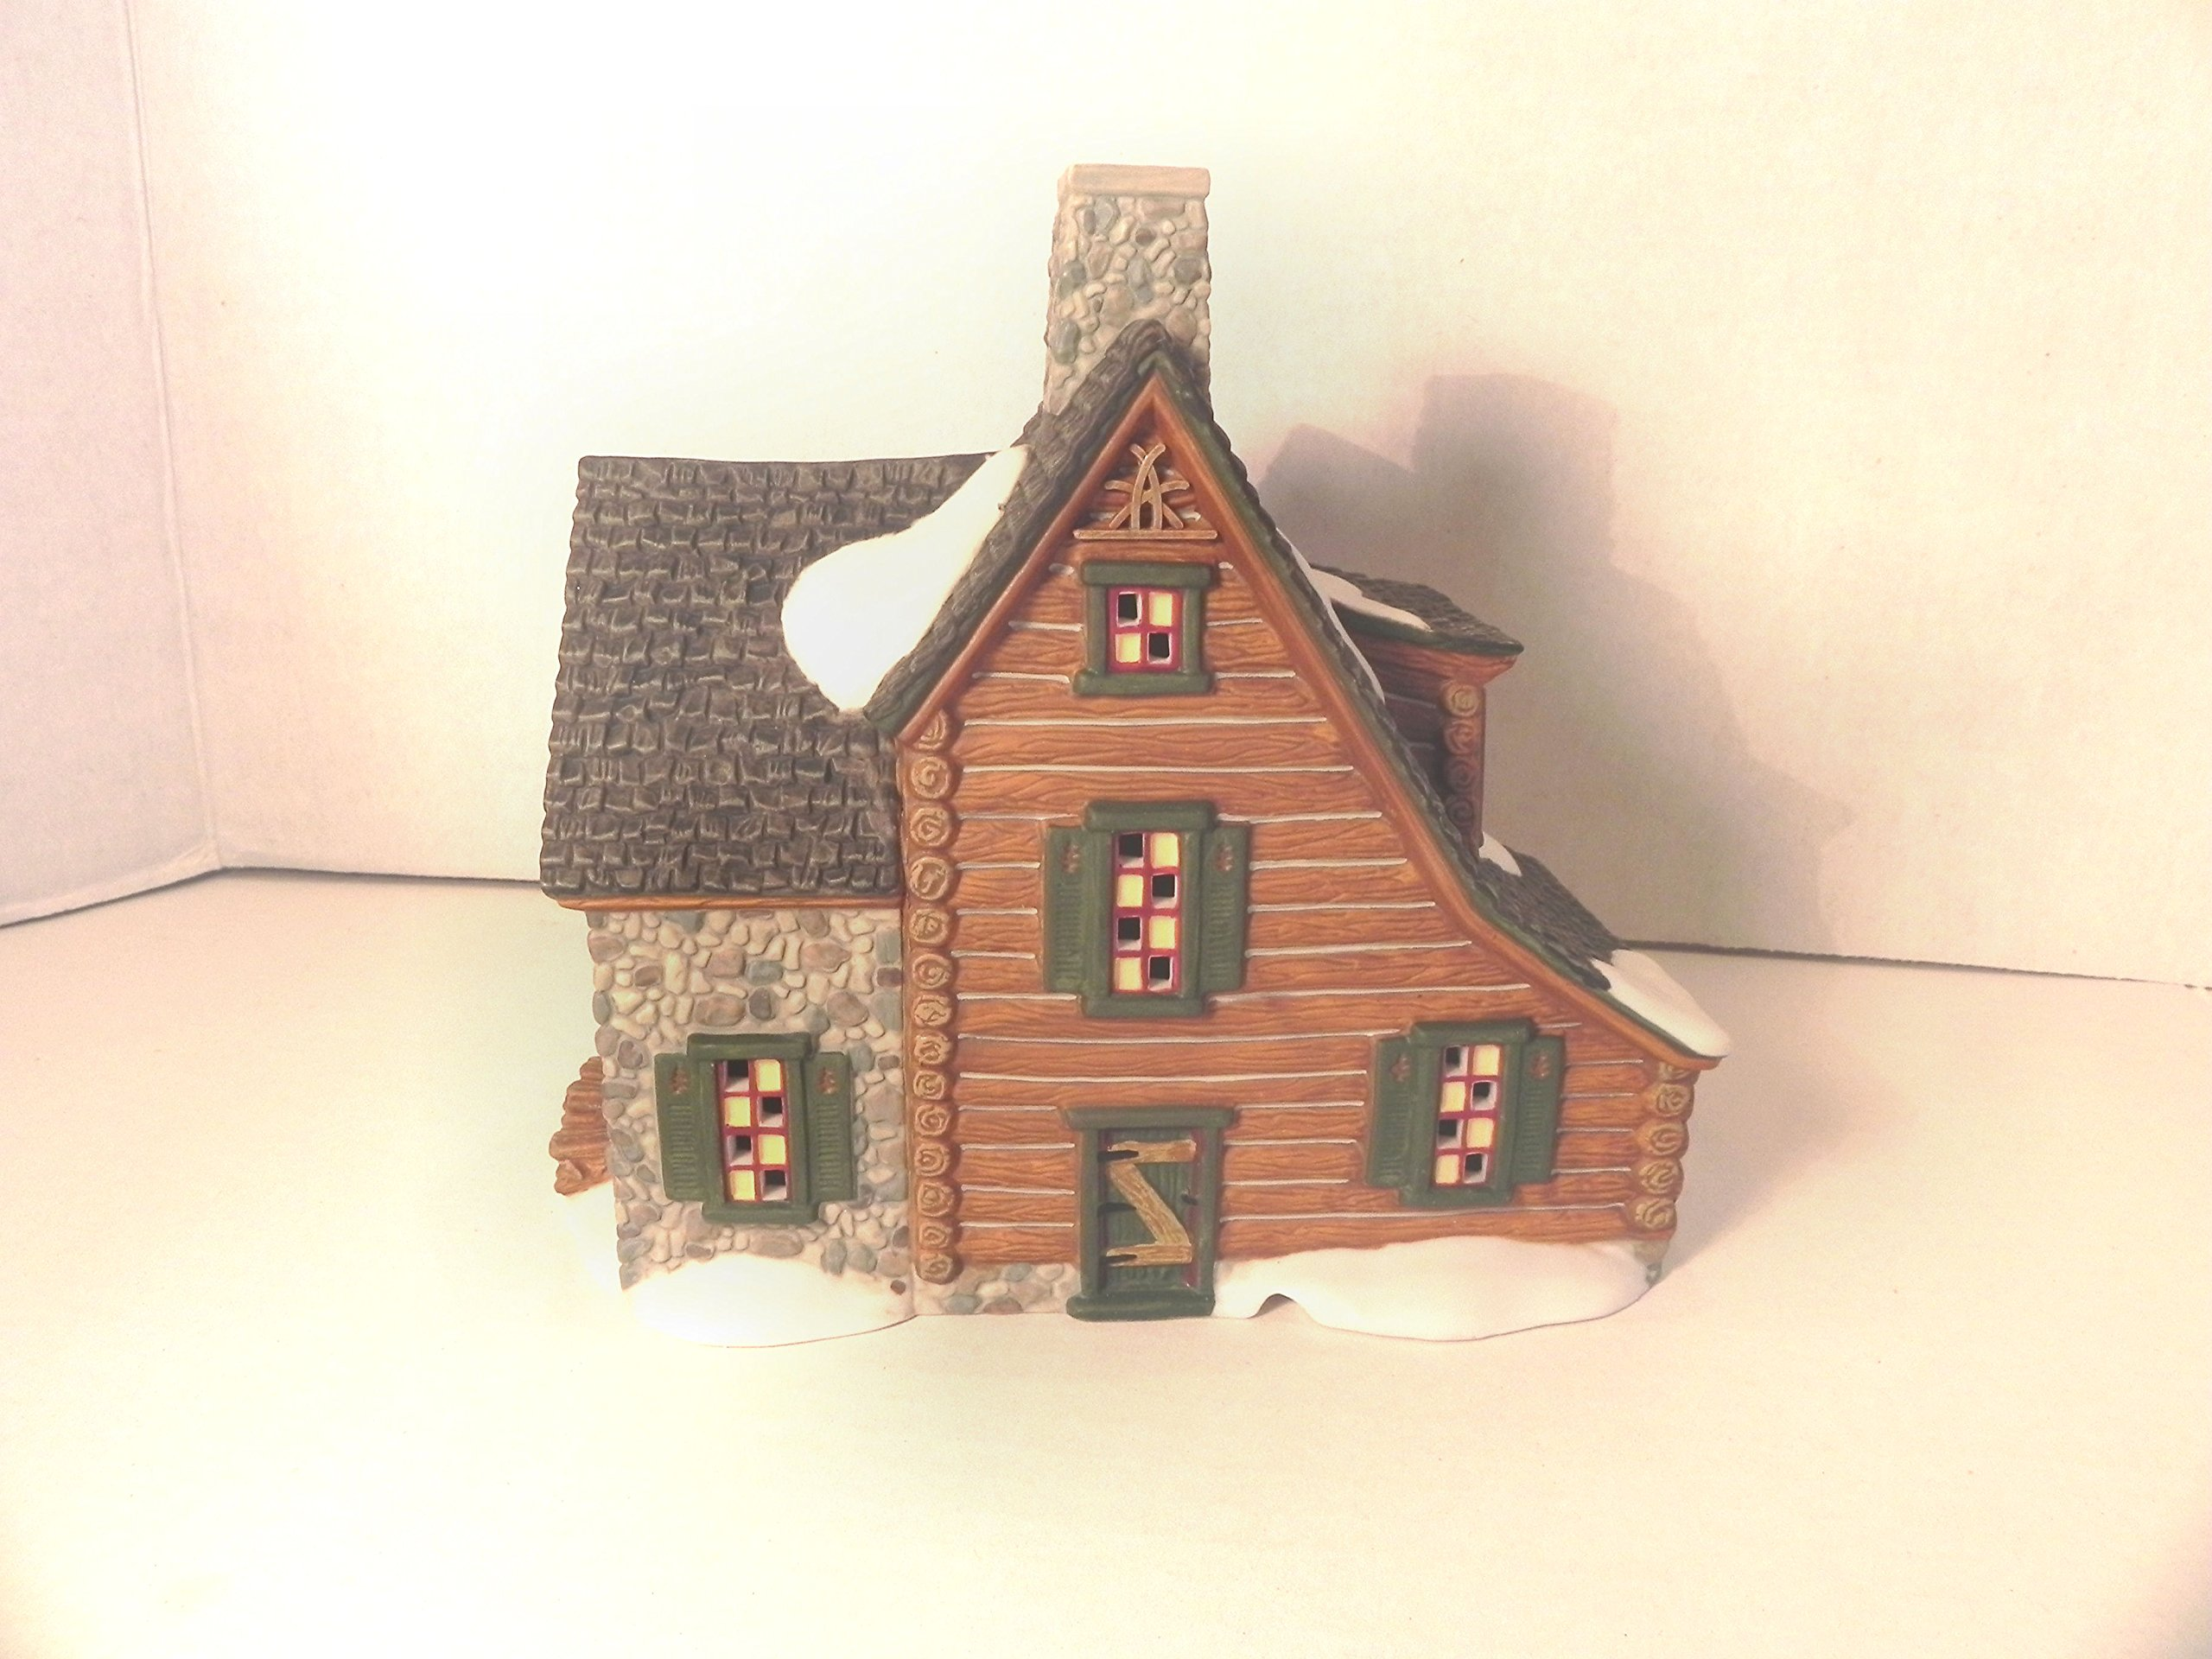 Dept 56 New England Village Series Mountain View Cabin #56.56625